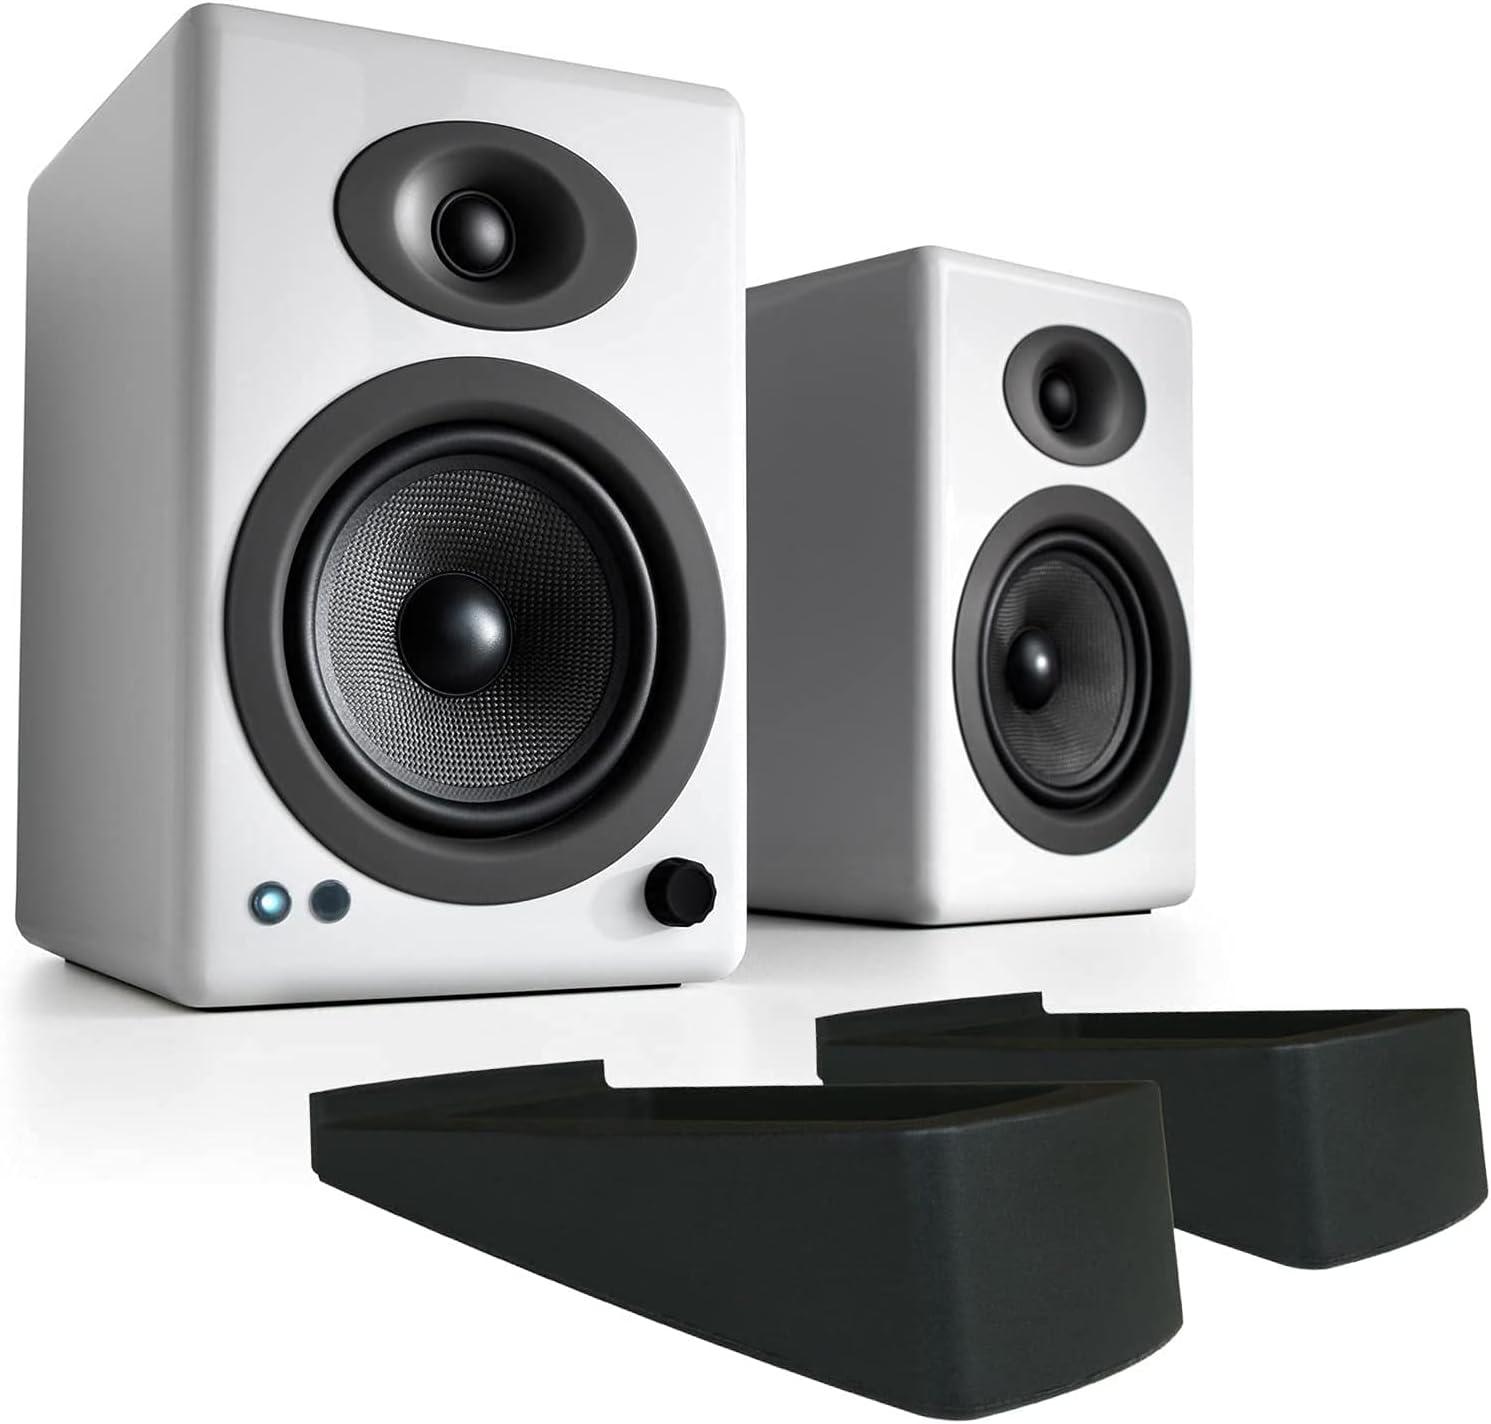 Selling rankings Audioengine A5+ Wireless Powered Bookshelf A Speaker Bundle Ranking TOP15 with